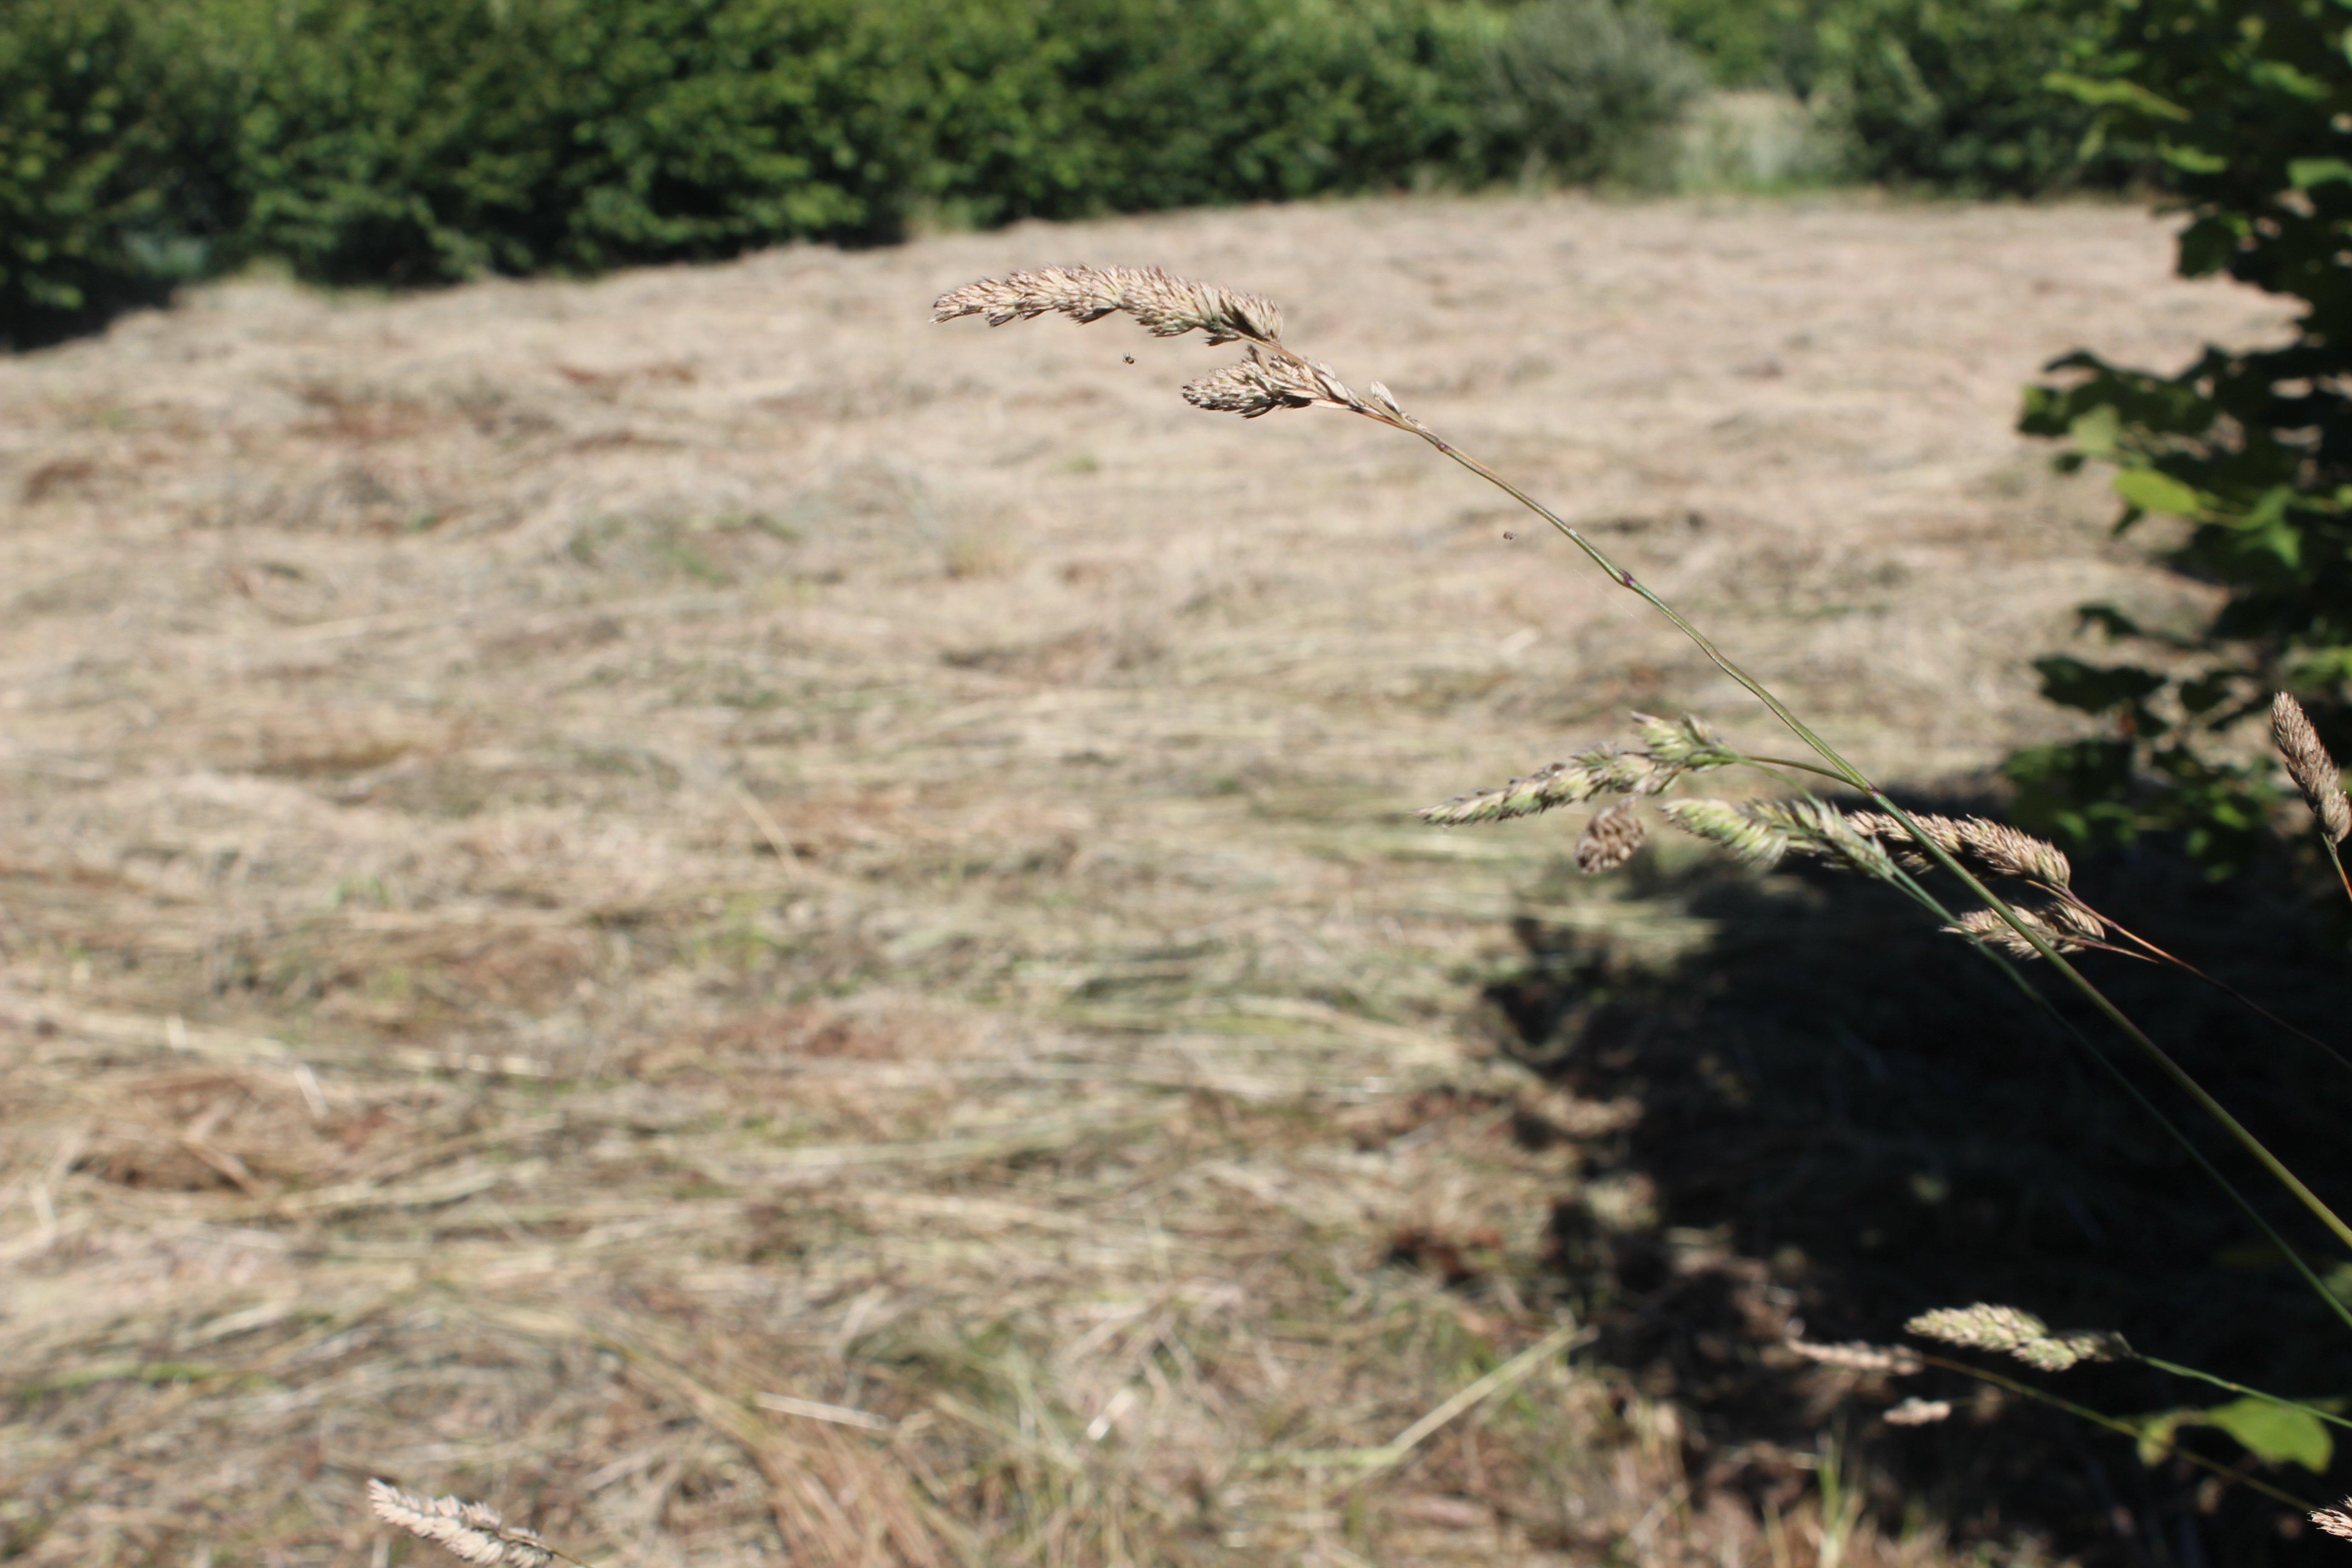 grass_cut field